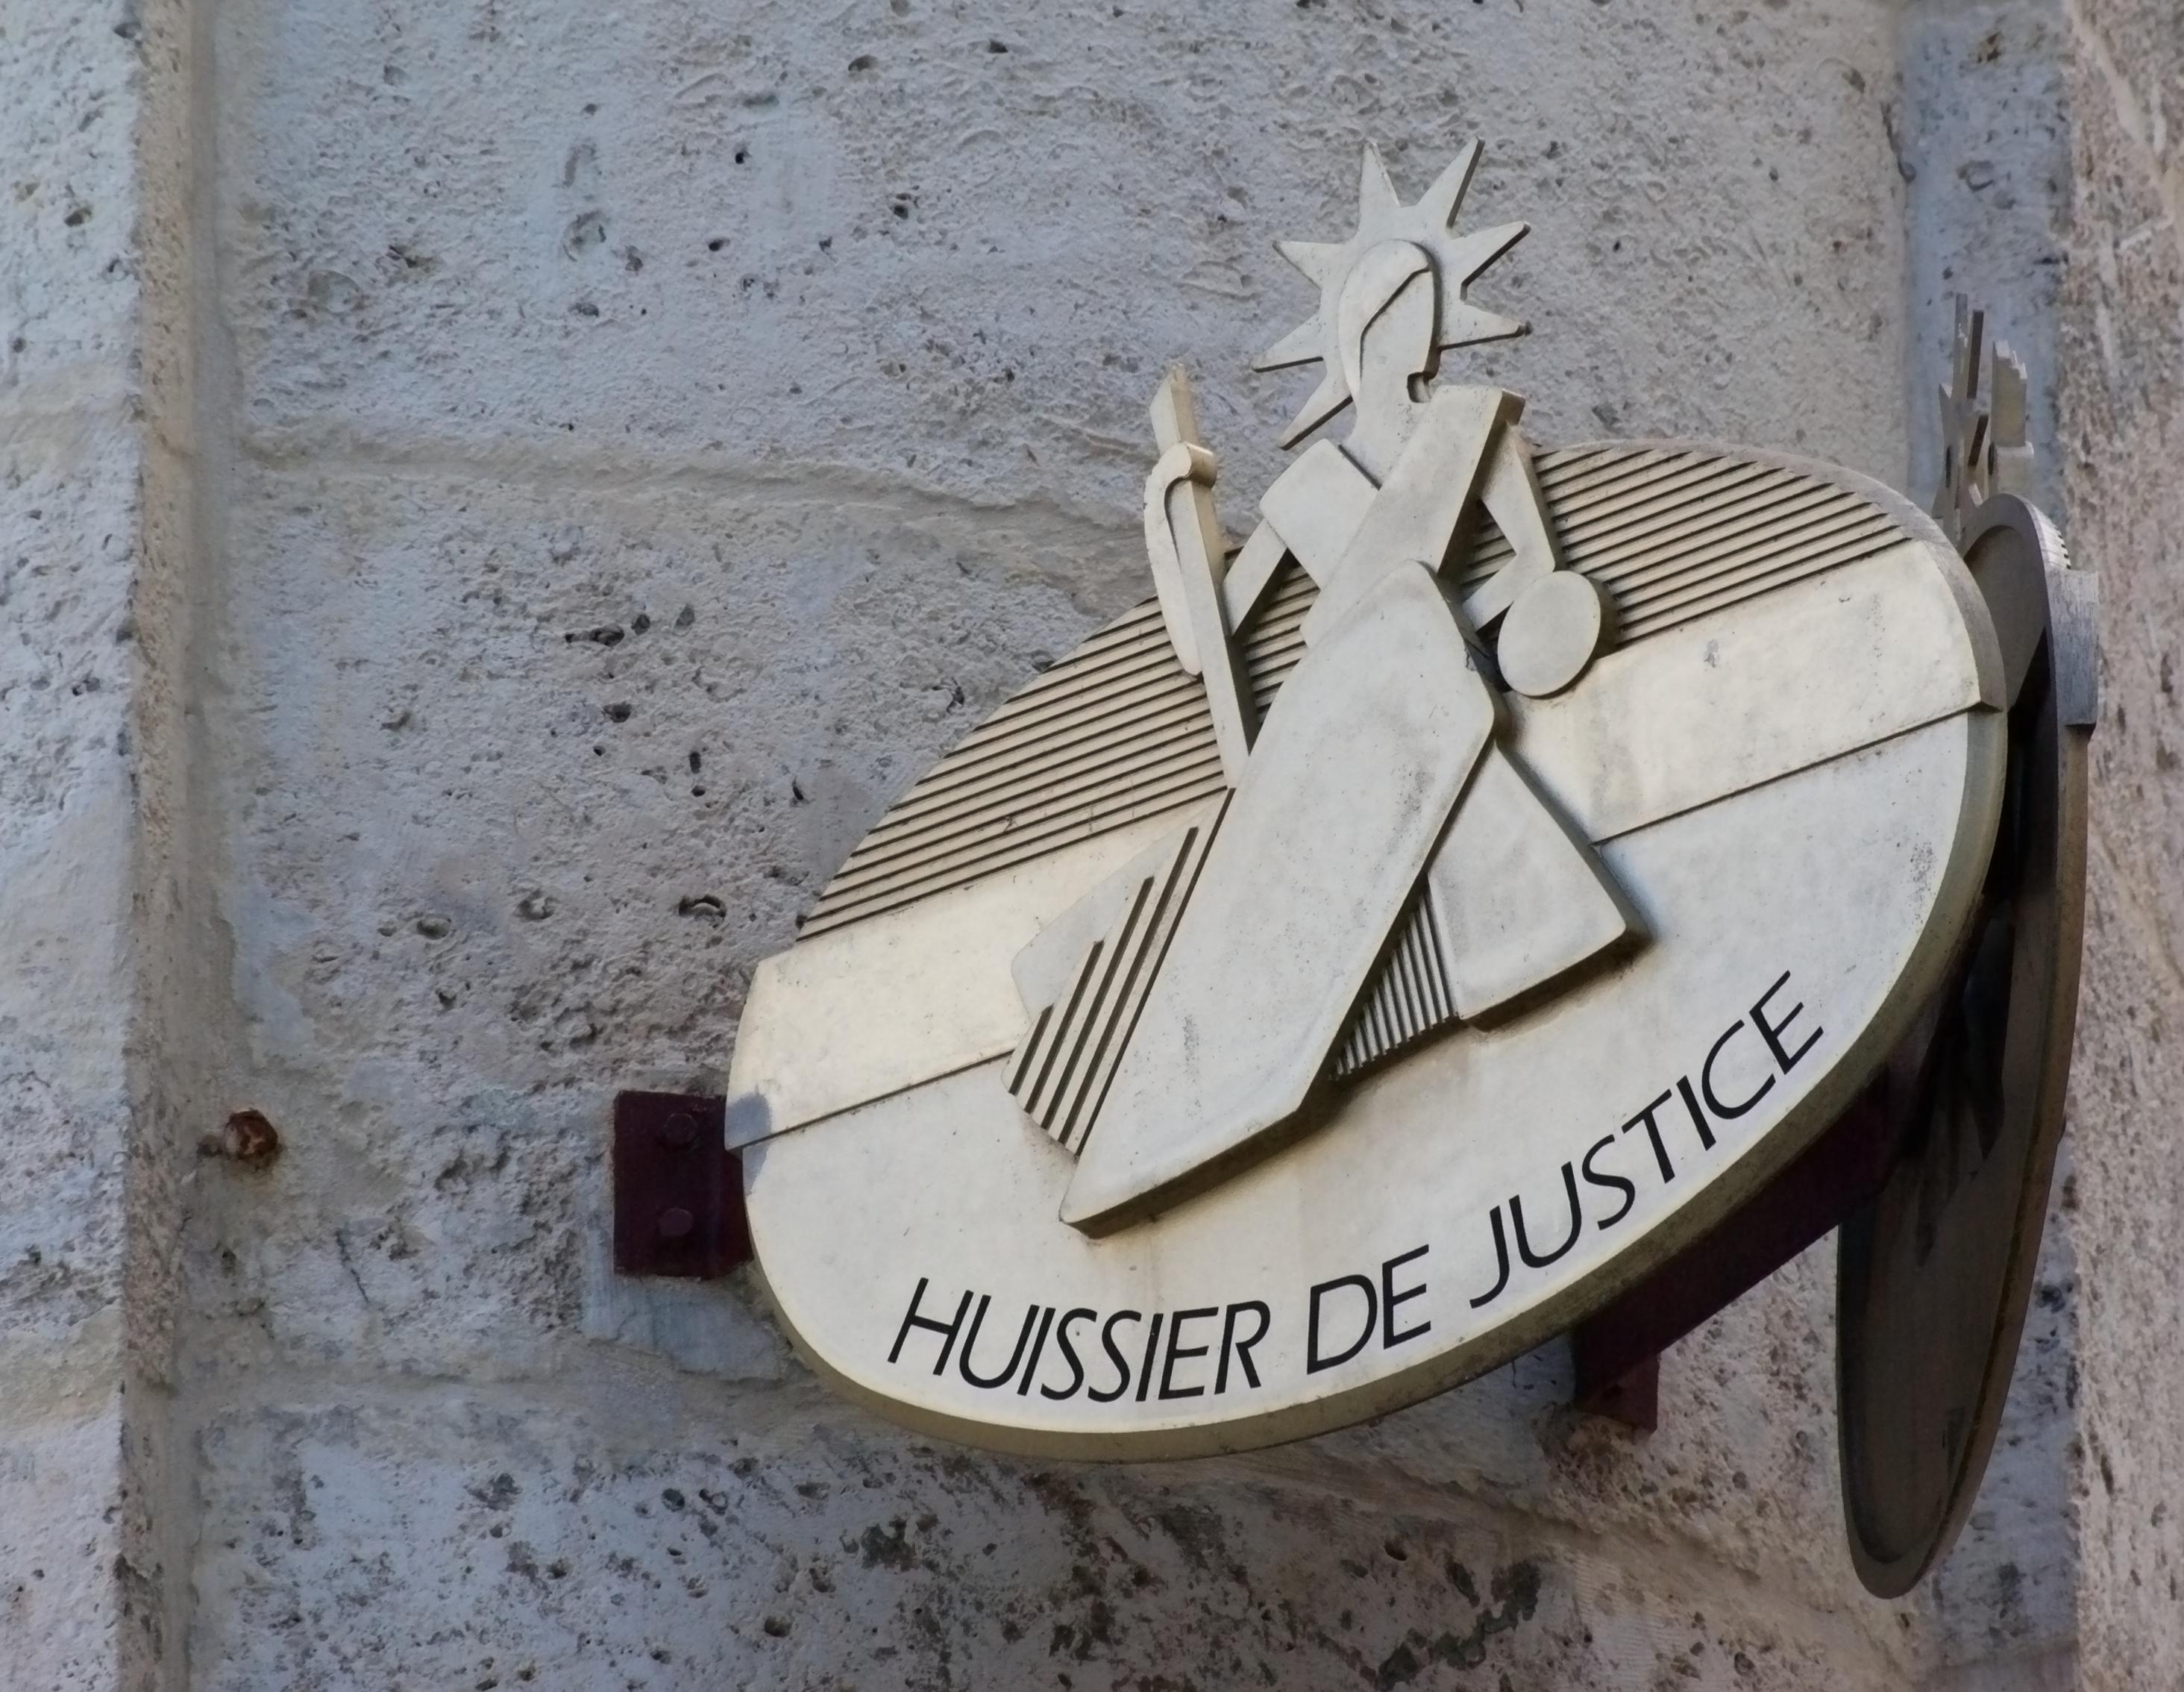 Huissier de justice wikiwand - Huissier de justice chambre nationale ...